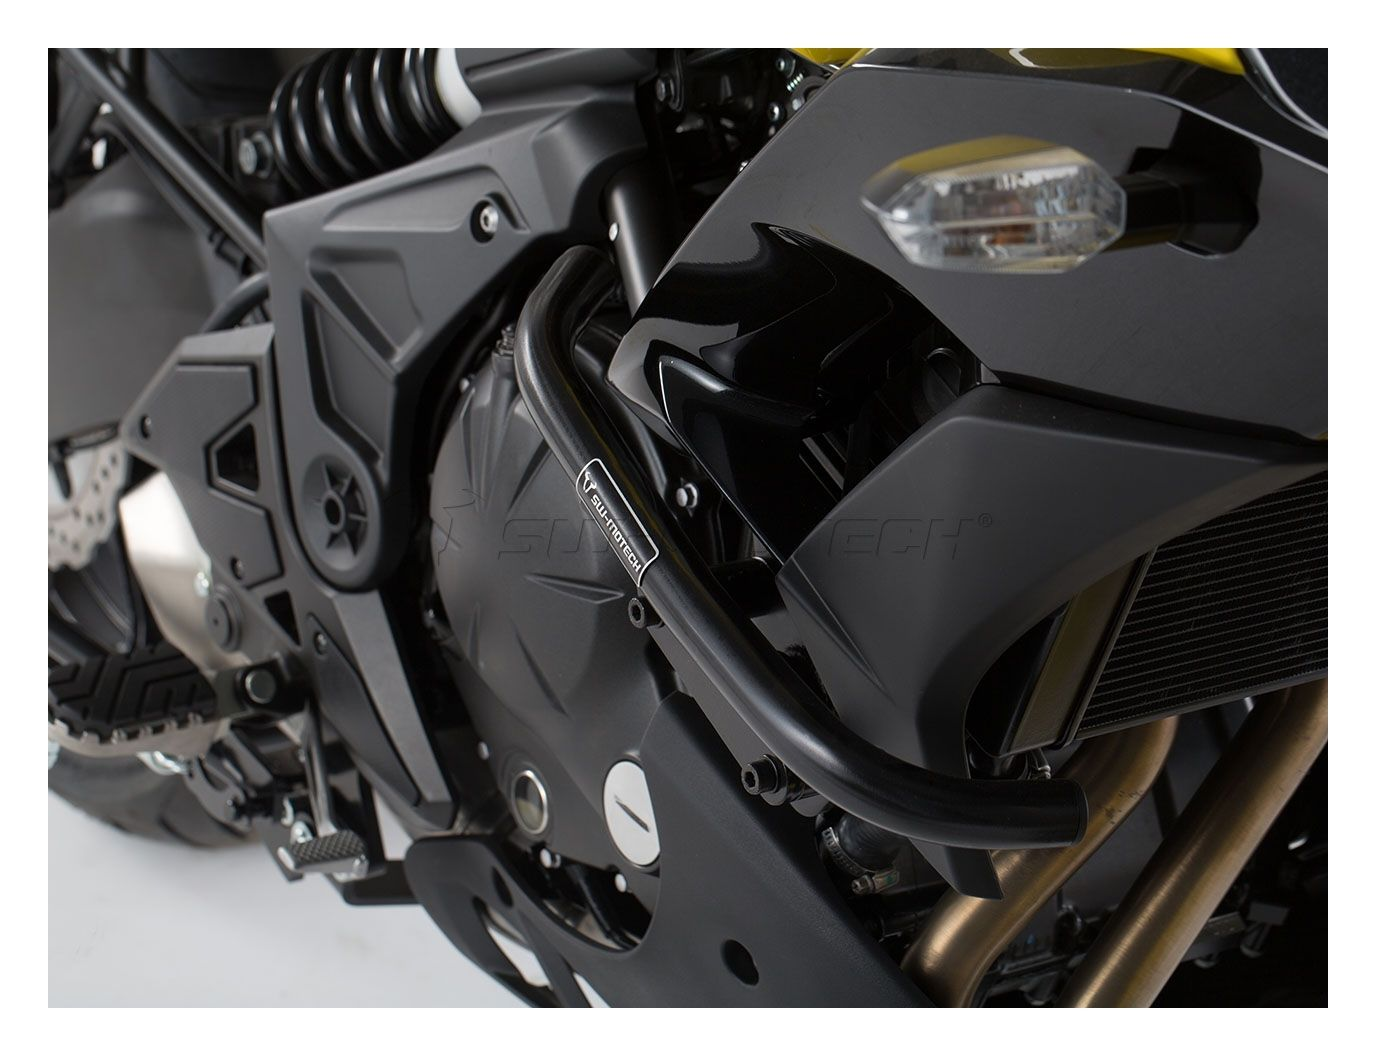 SW-MOTECH Crash Bars Kawasaki Versys 650 2015-2018 - RevZilla